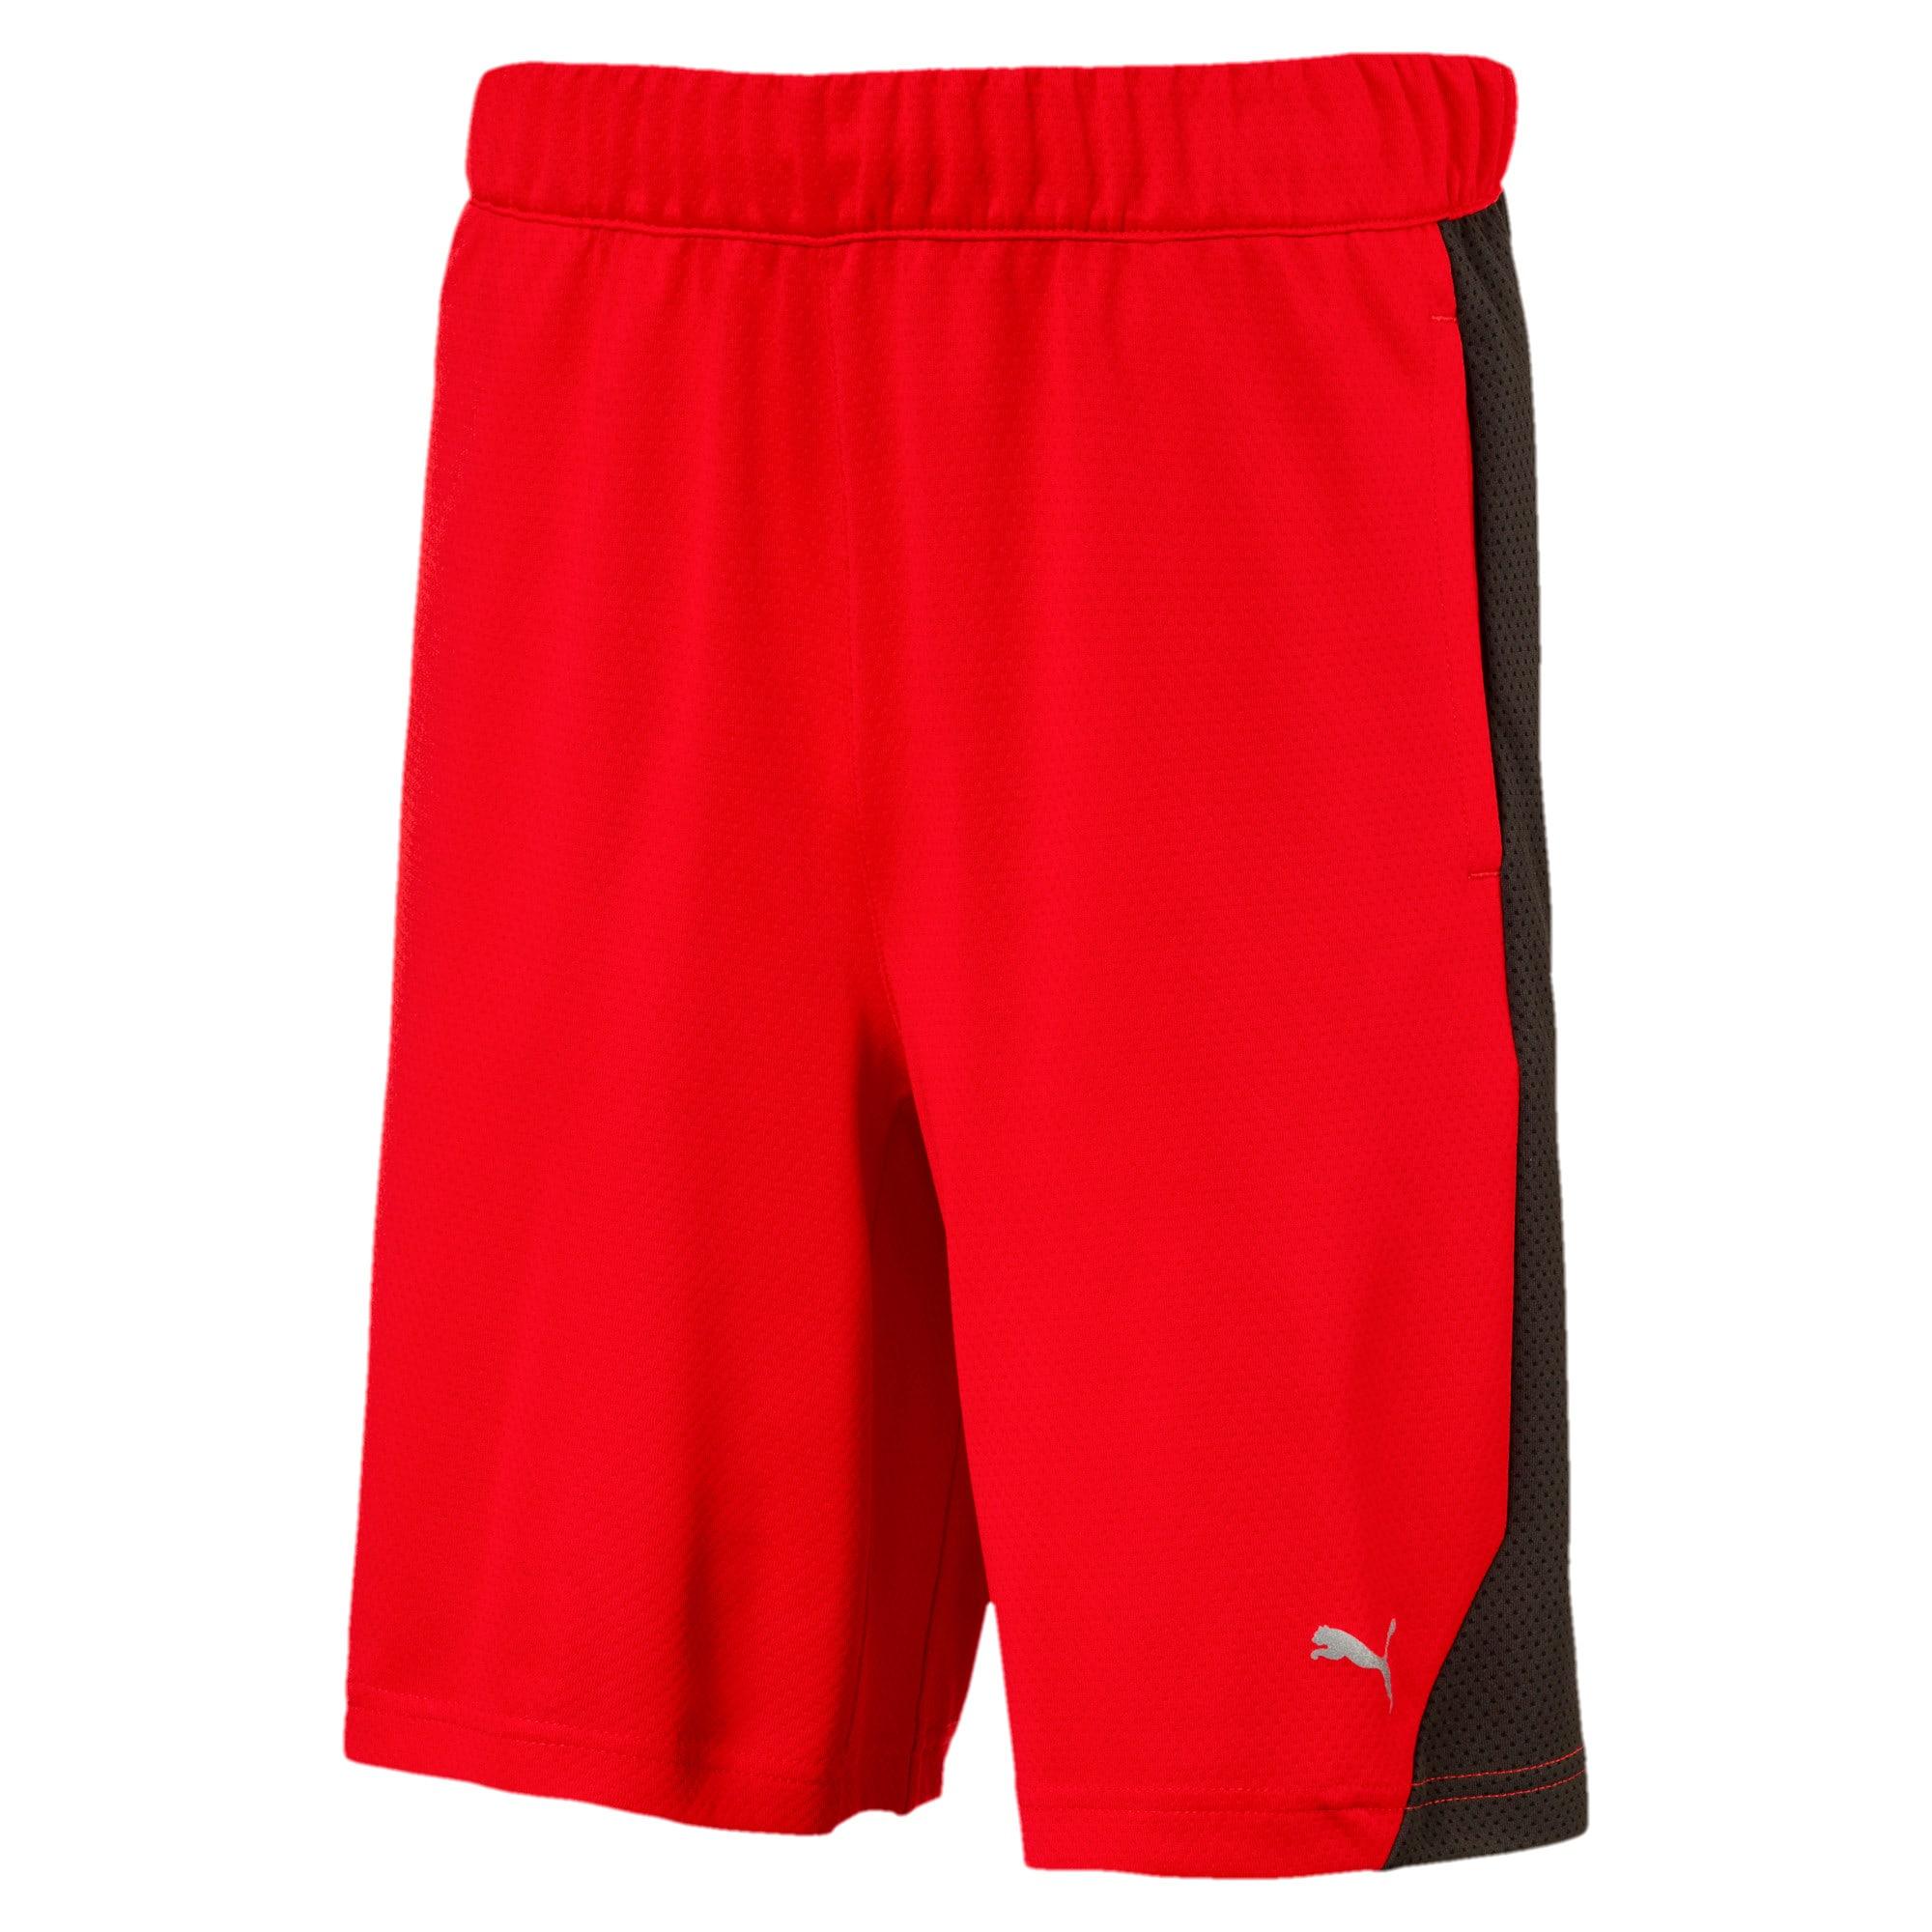 Thumbnail 1 of Boys' Gym Shorts, Flame Scarlet, medium-IND